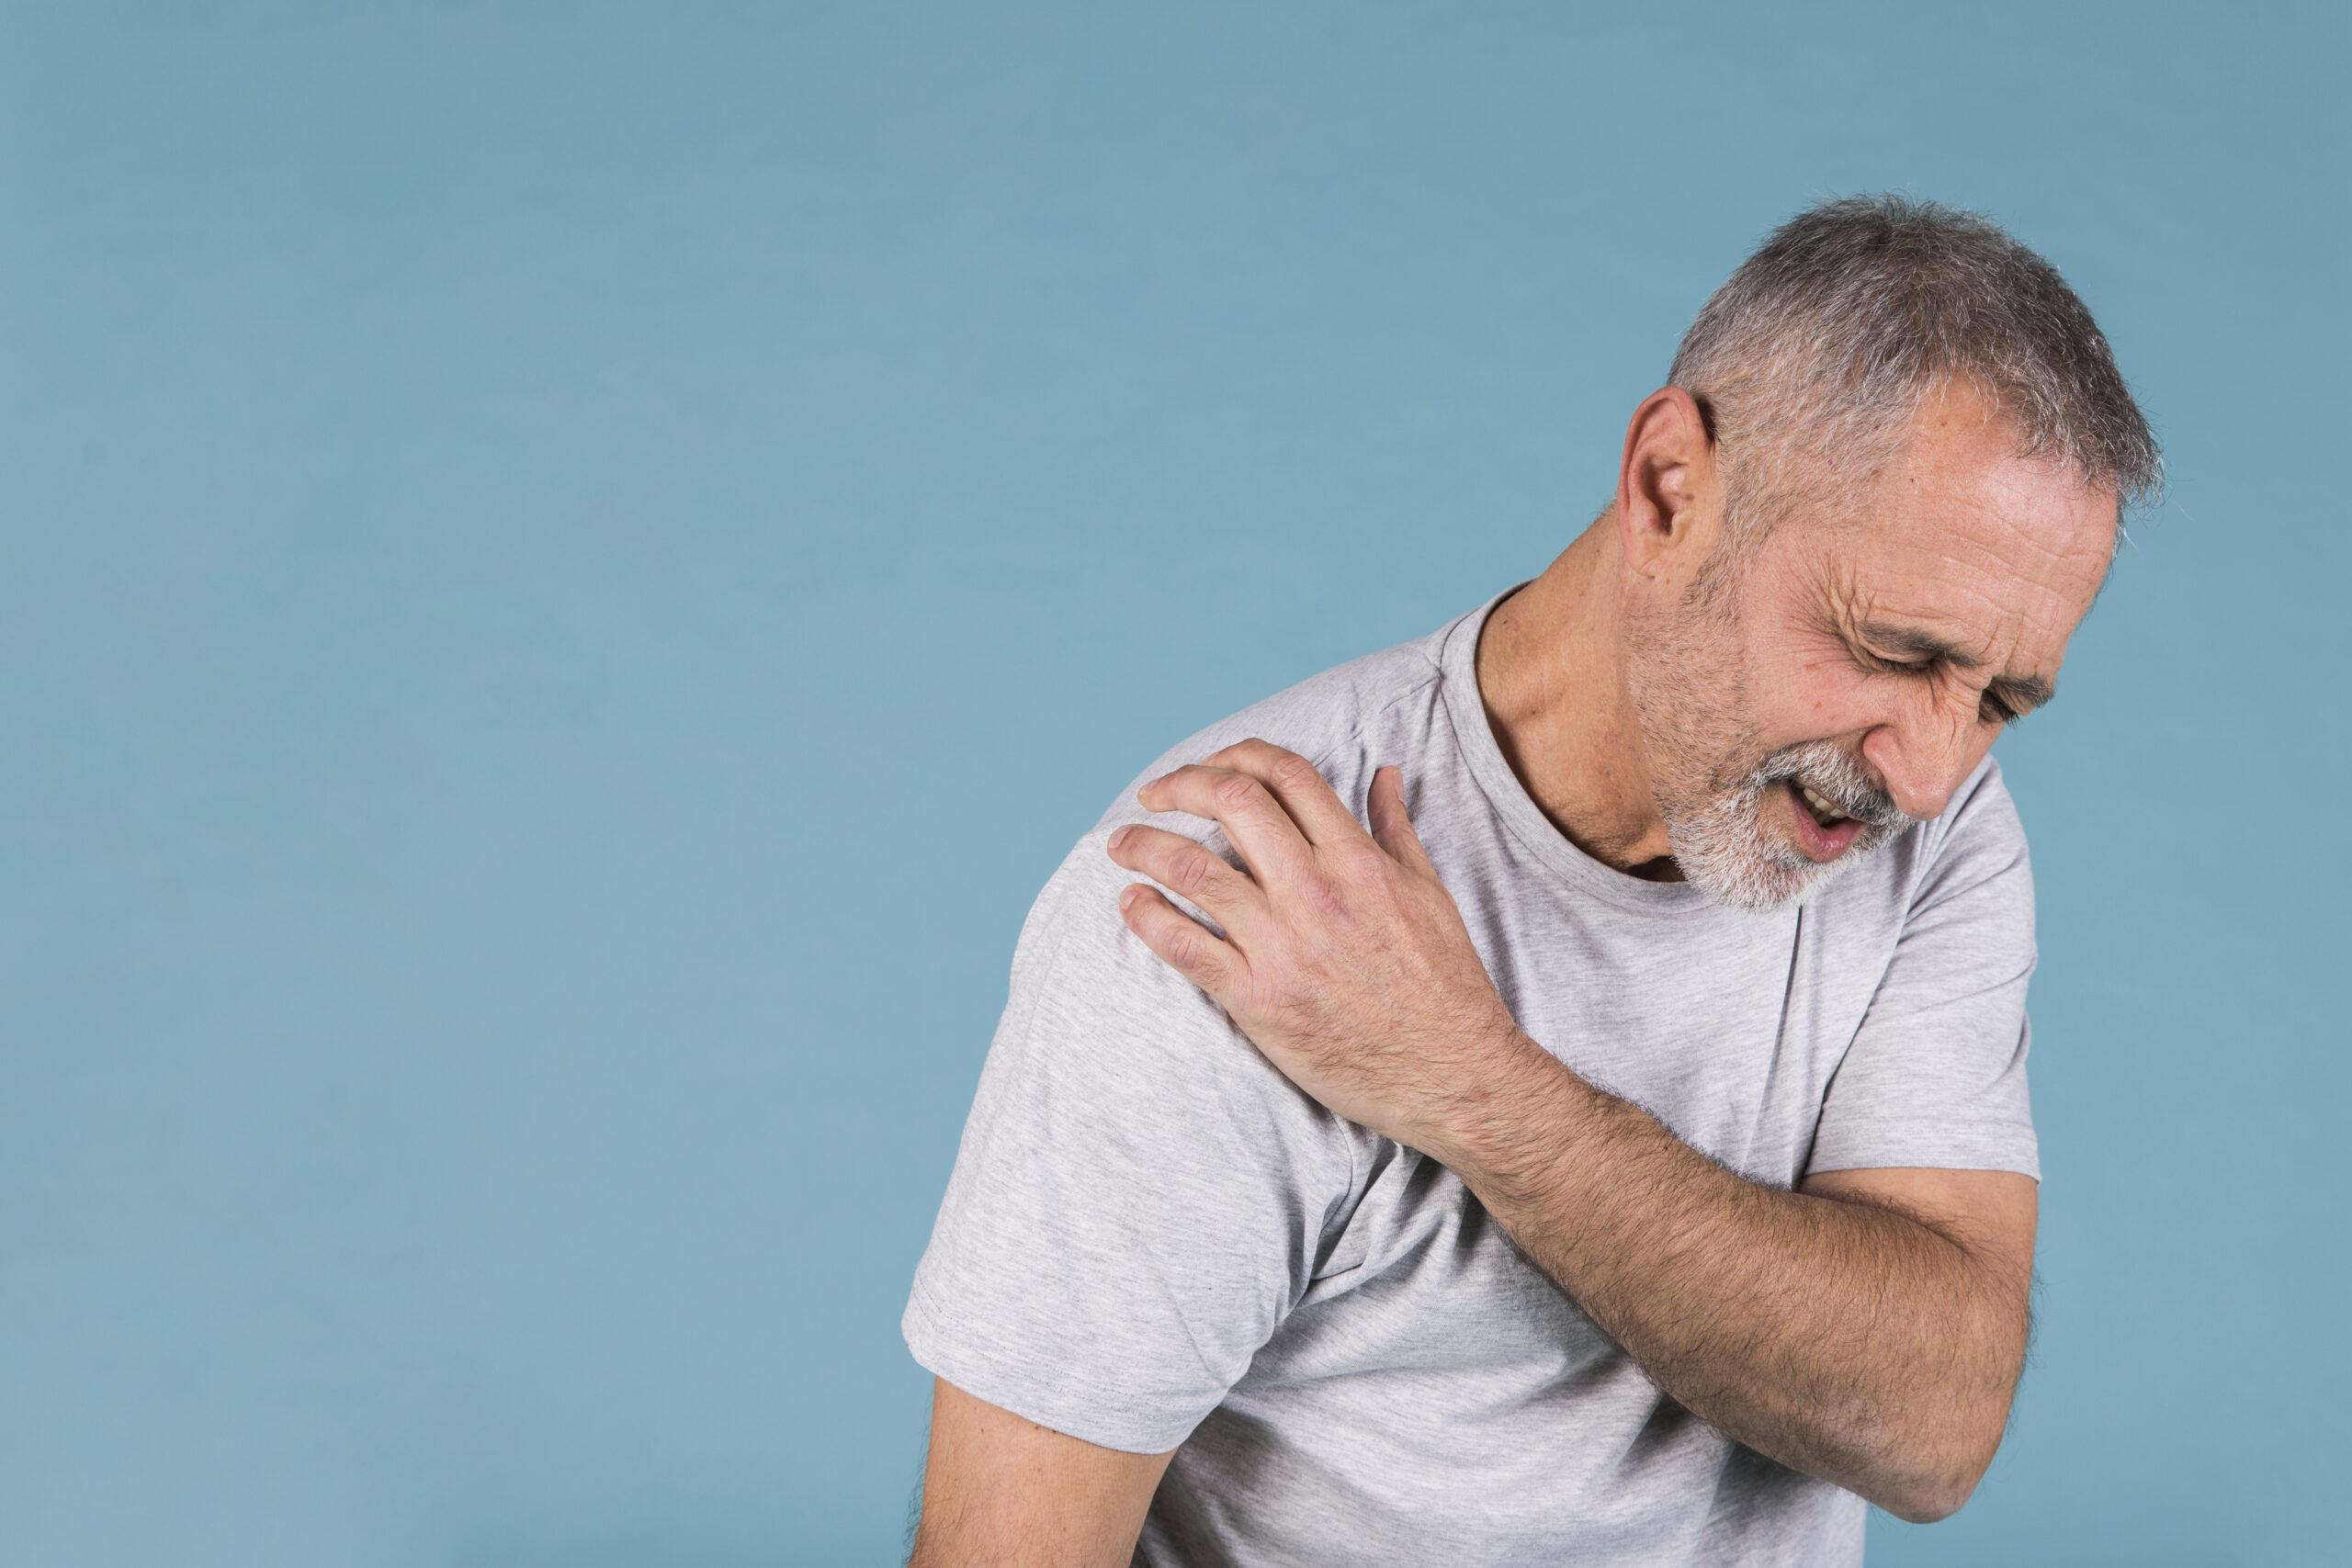 Ruptura svalů rotátorové manžety